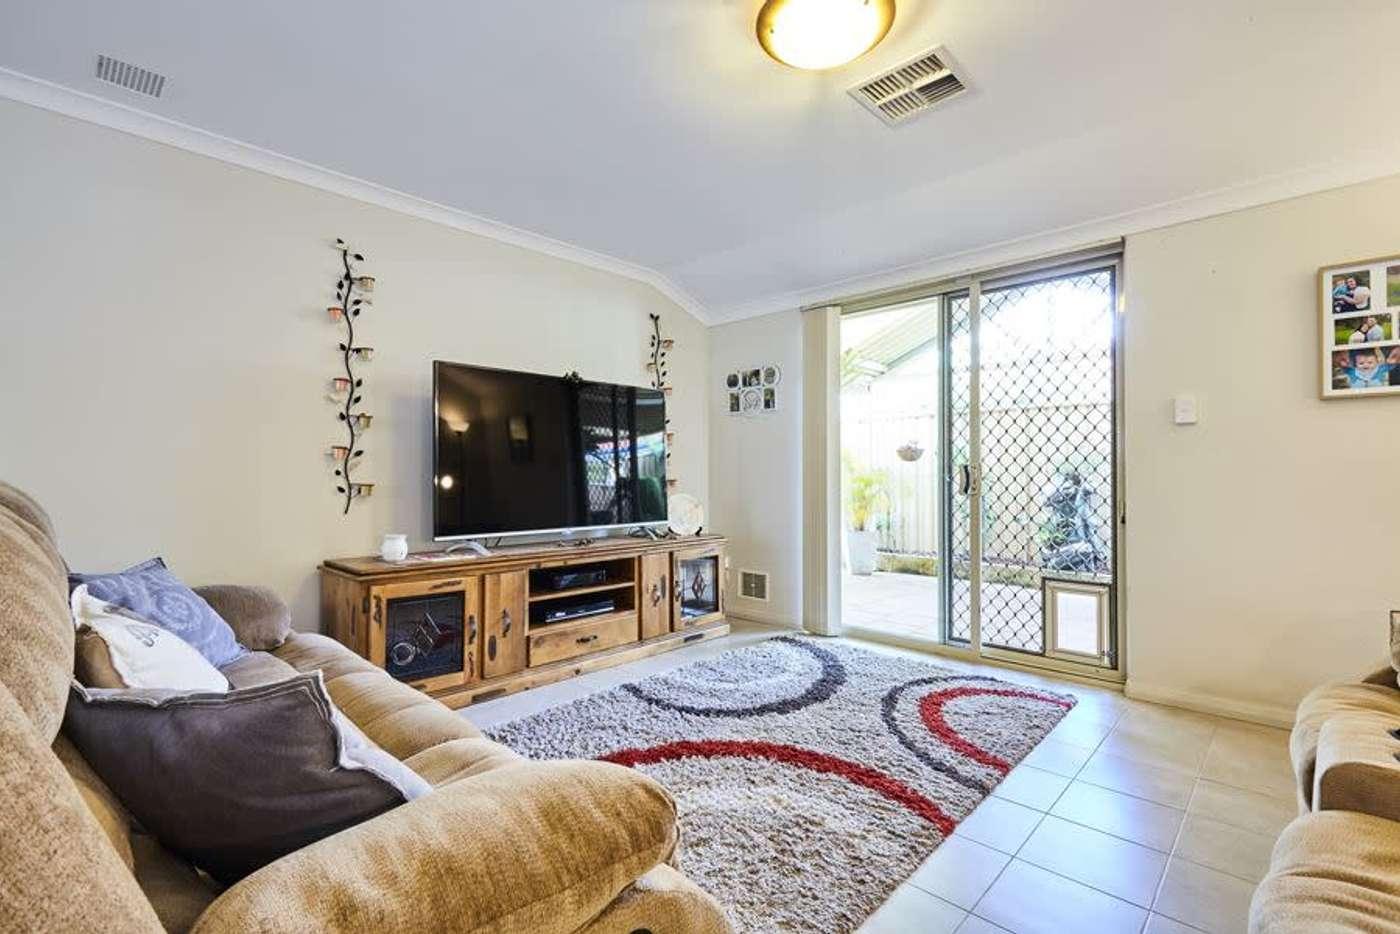 Seventh view of Homely house listing, 38 Senecio Lane, Beeliar WA 6164